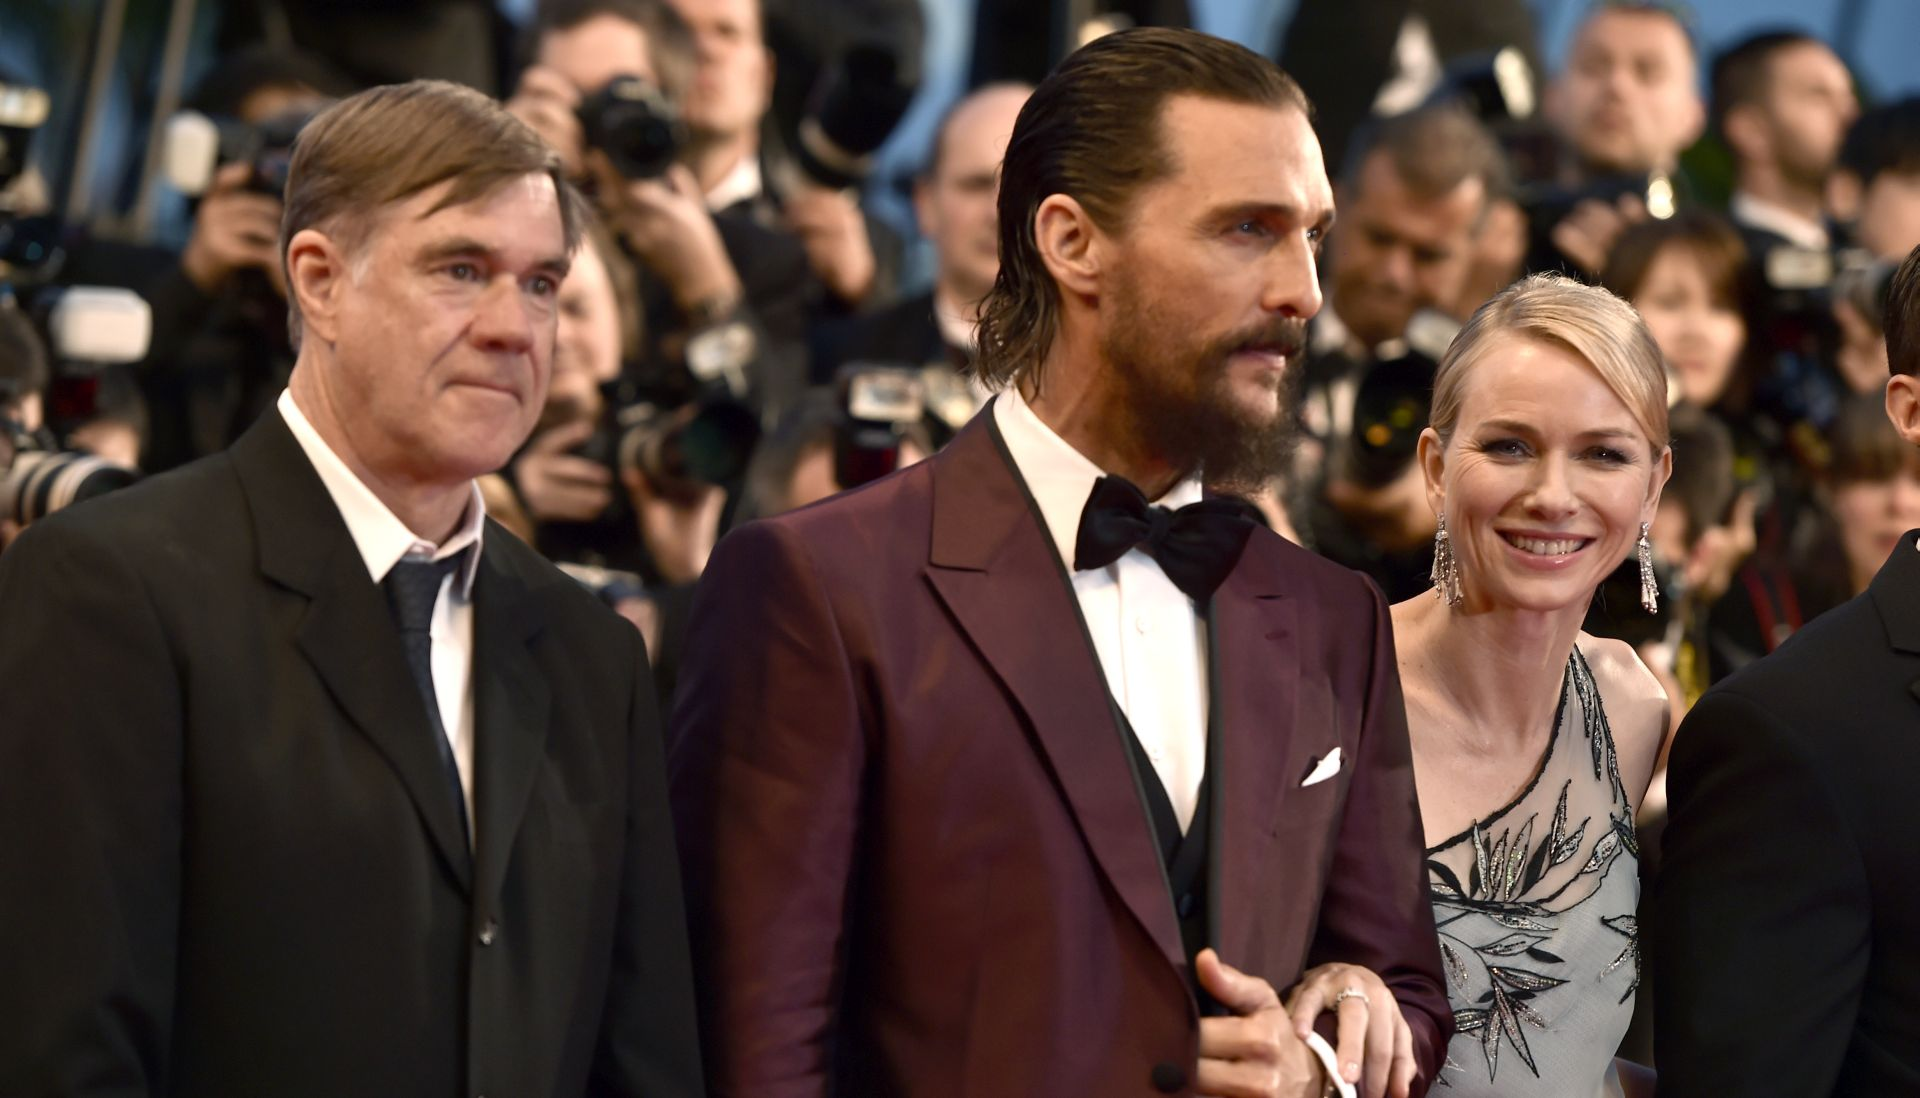 CANNES, 4. DAN: Matthew McConaughey izviždan zbog sramotnog filma